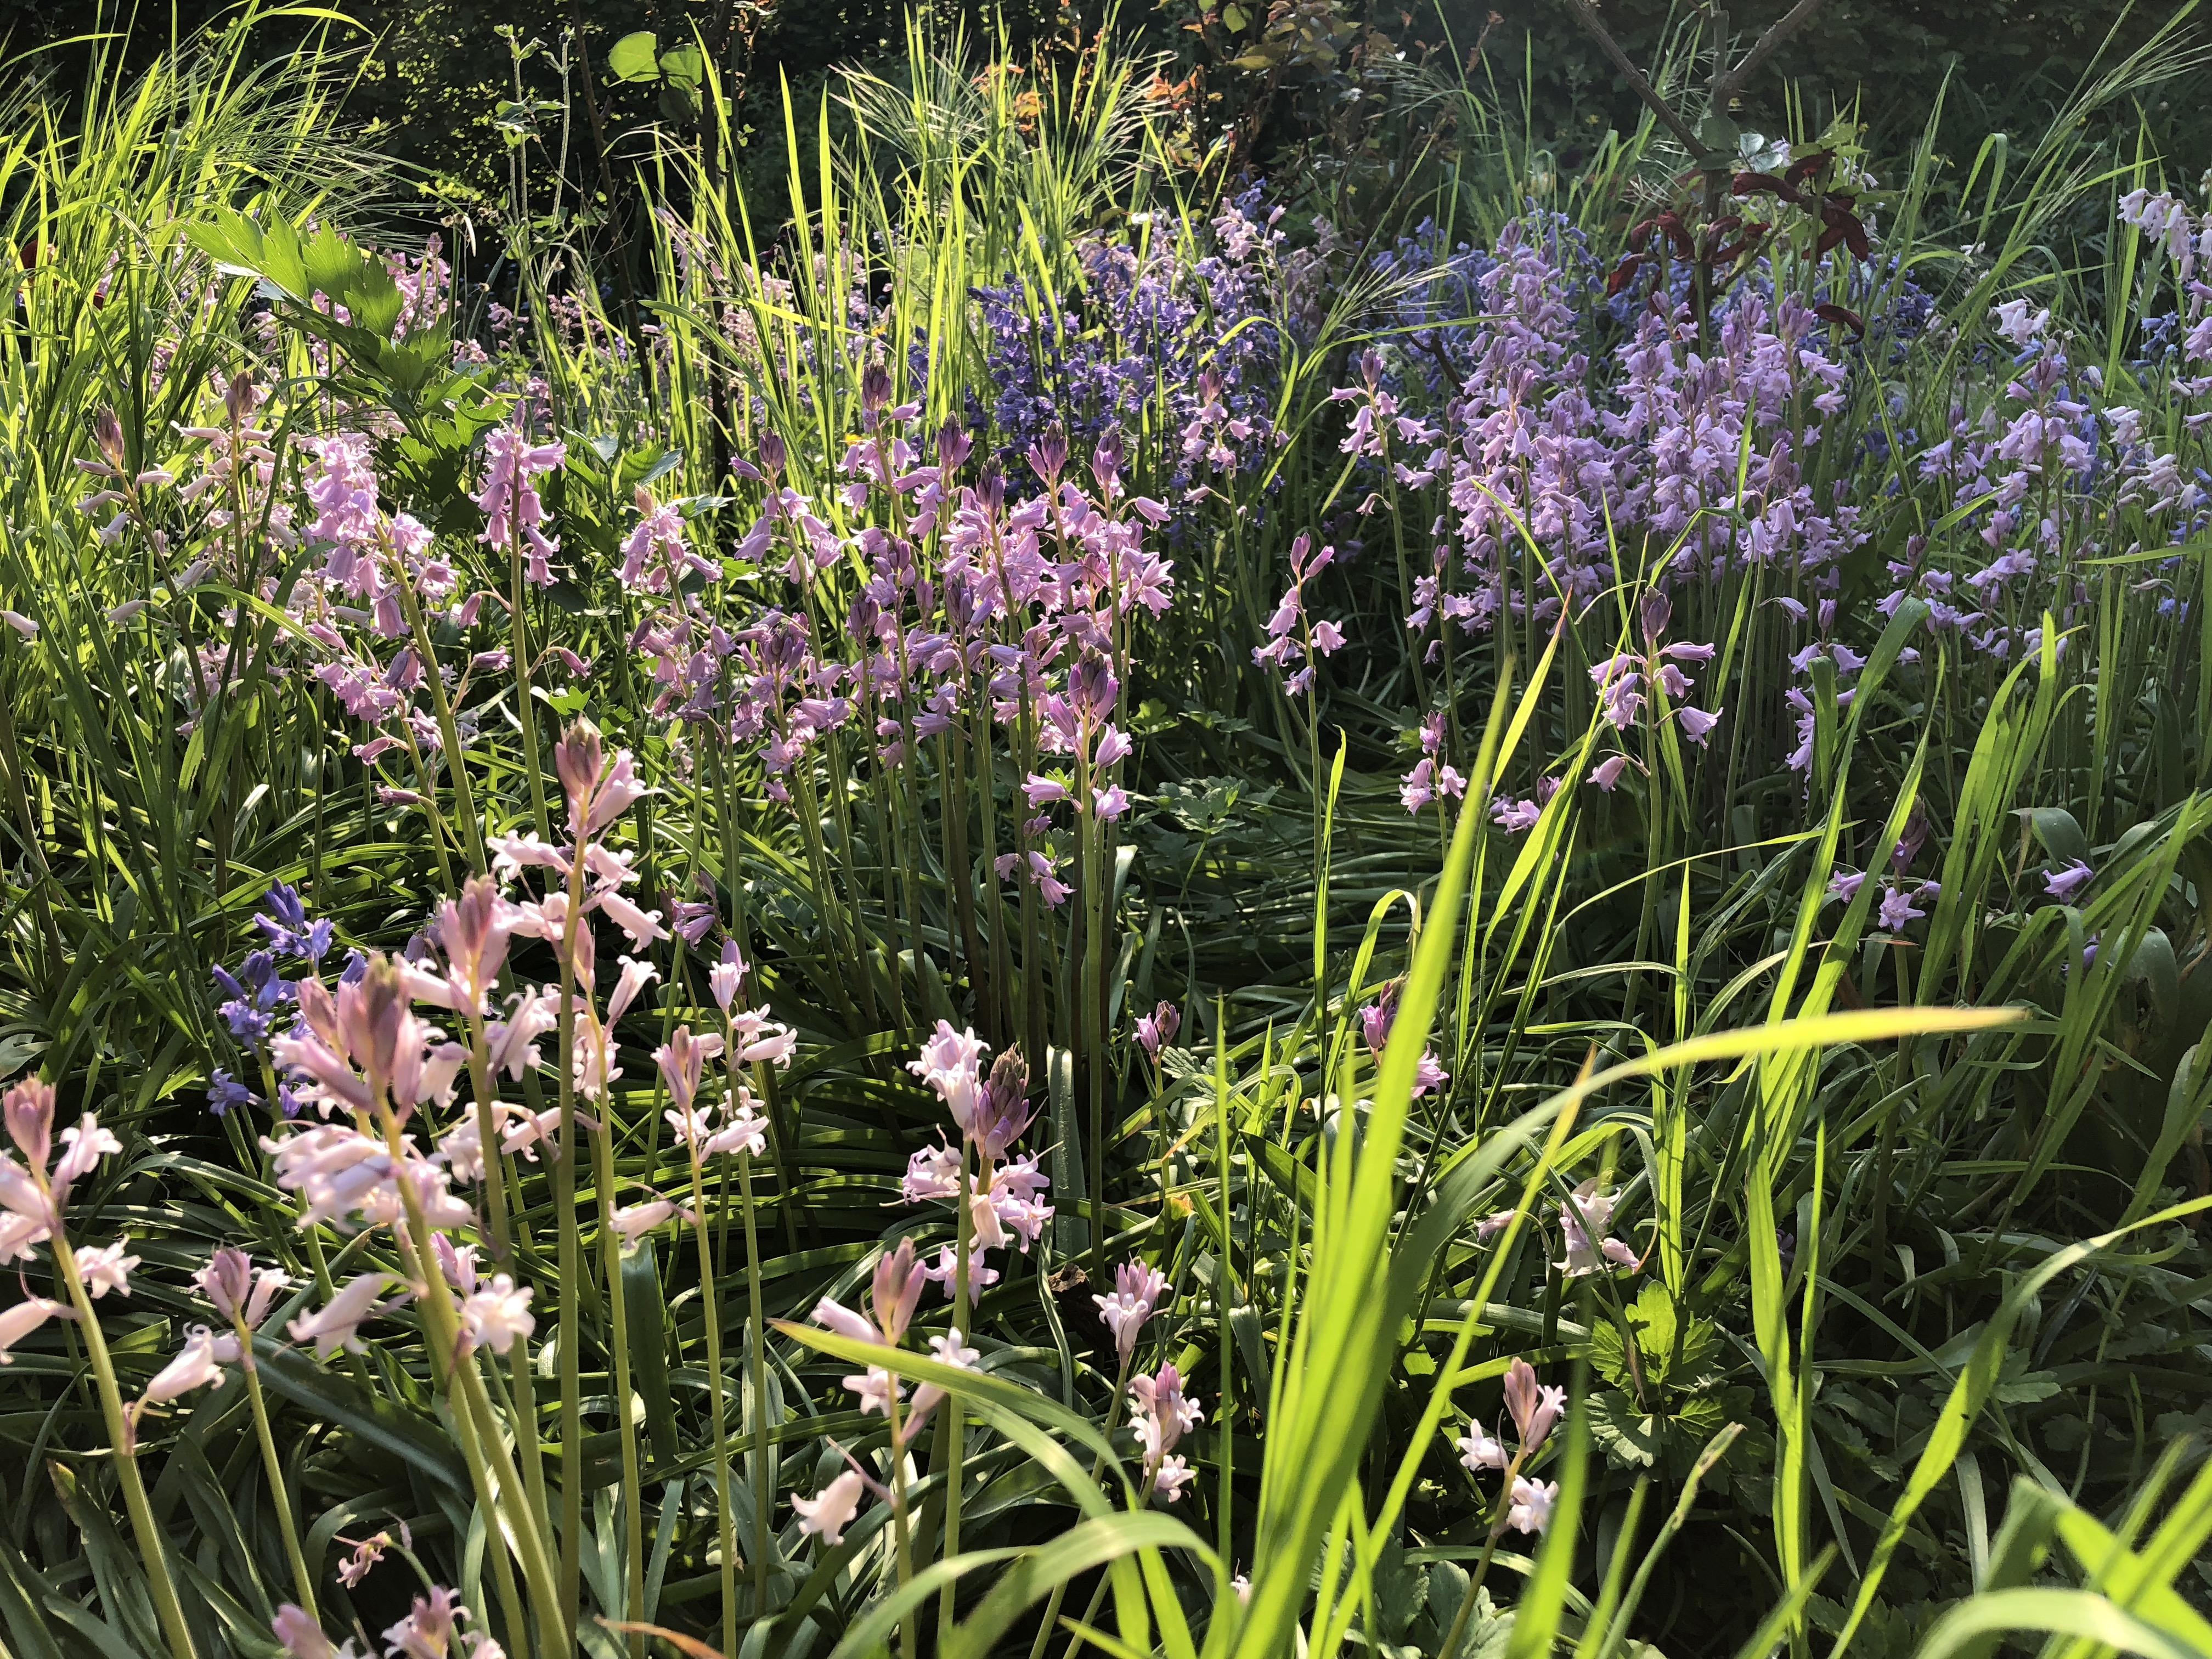 Gardening - a good way to destress?